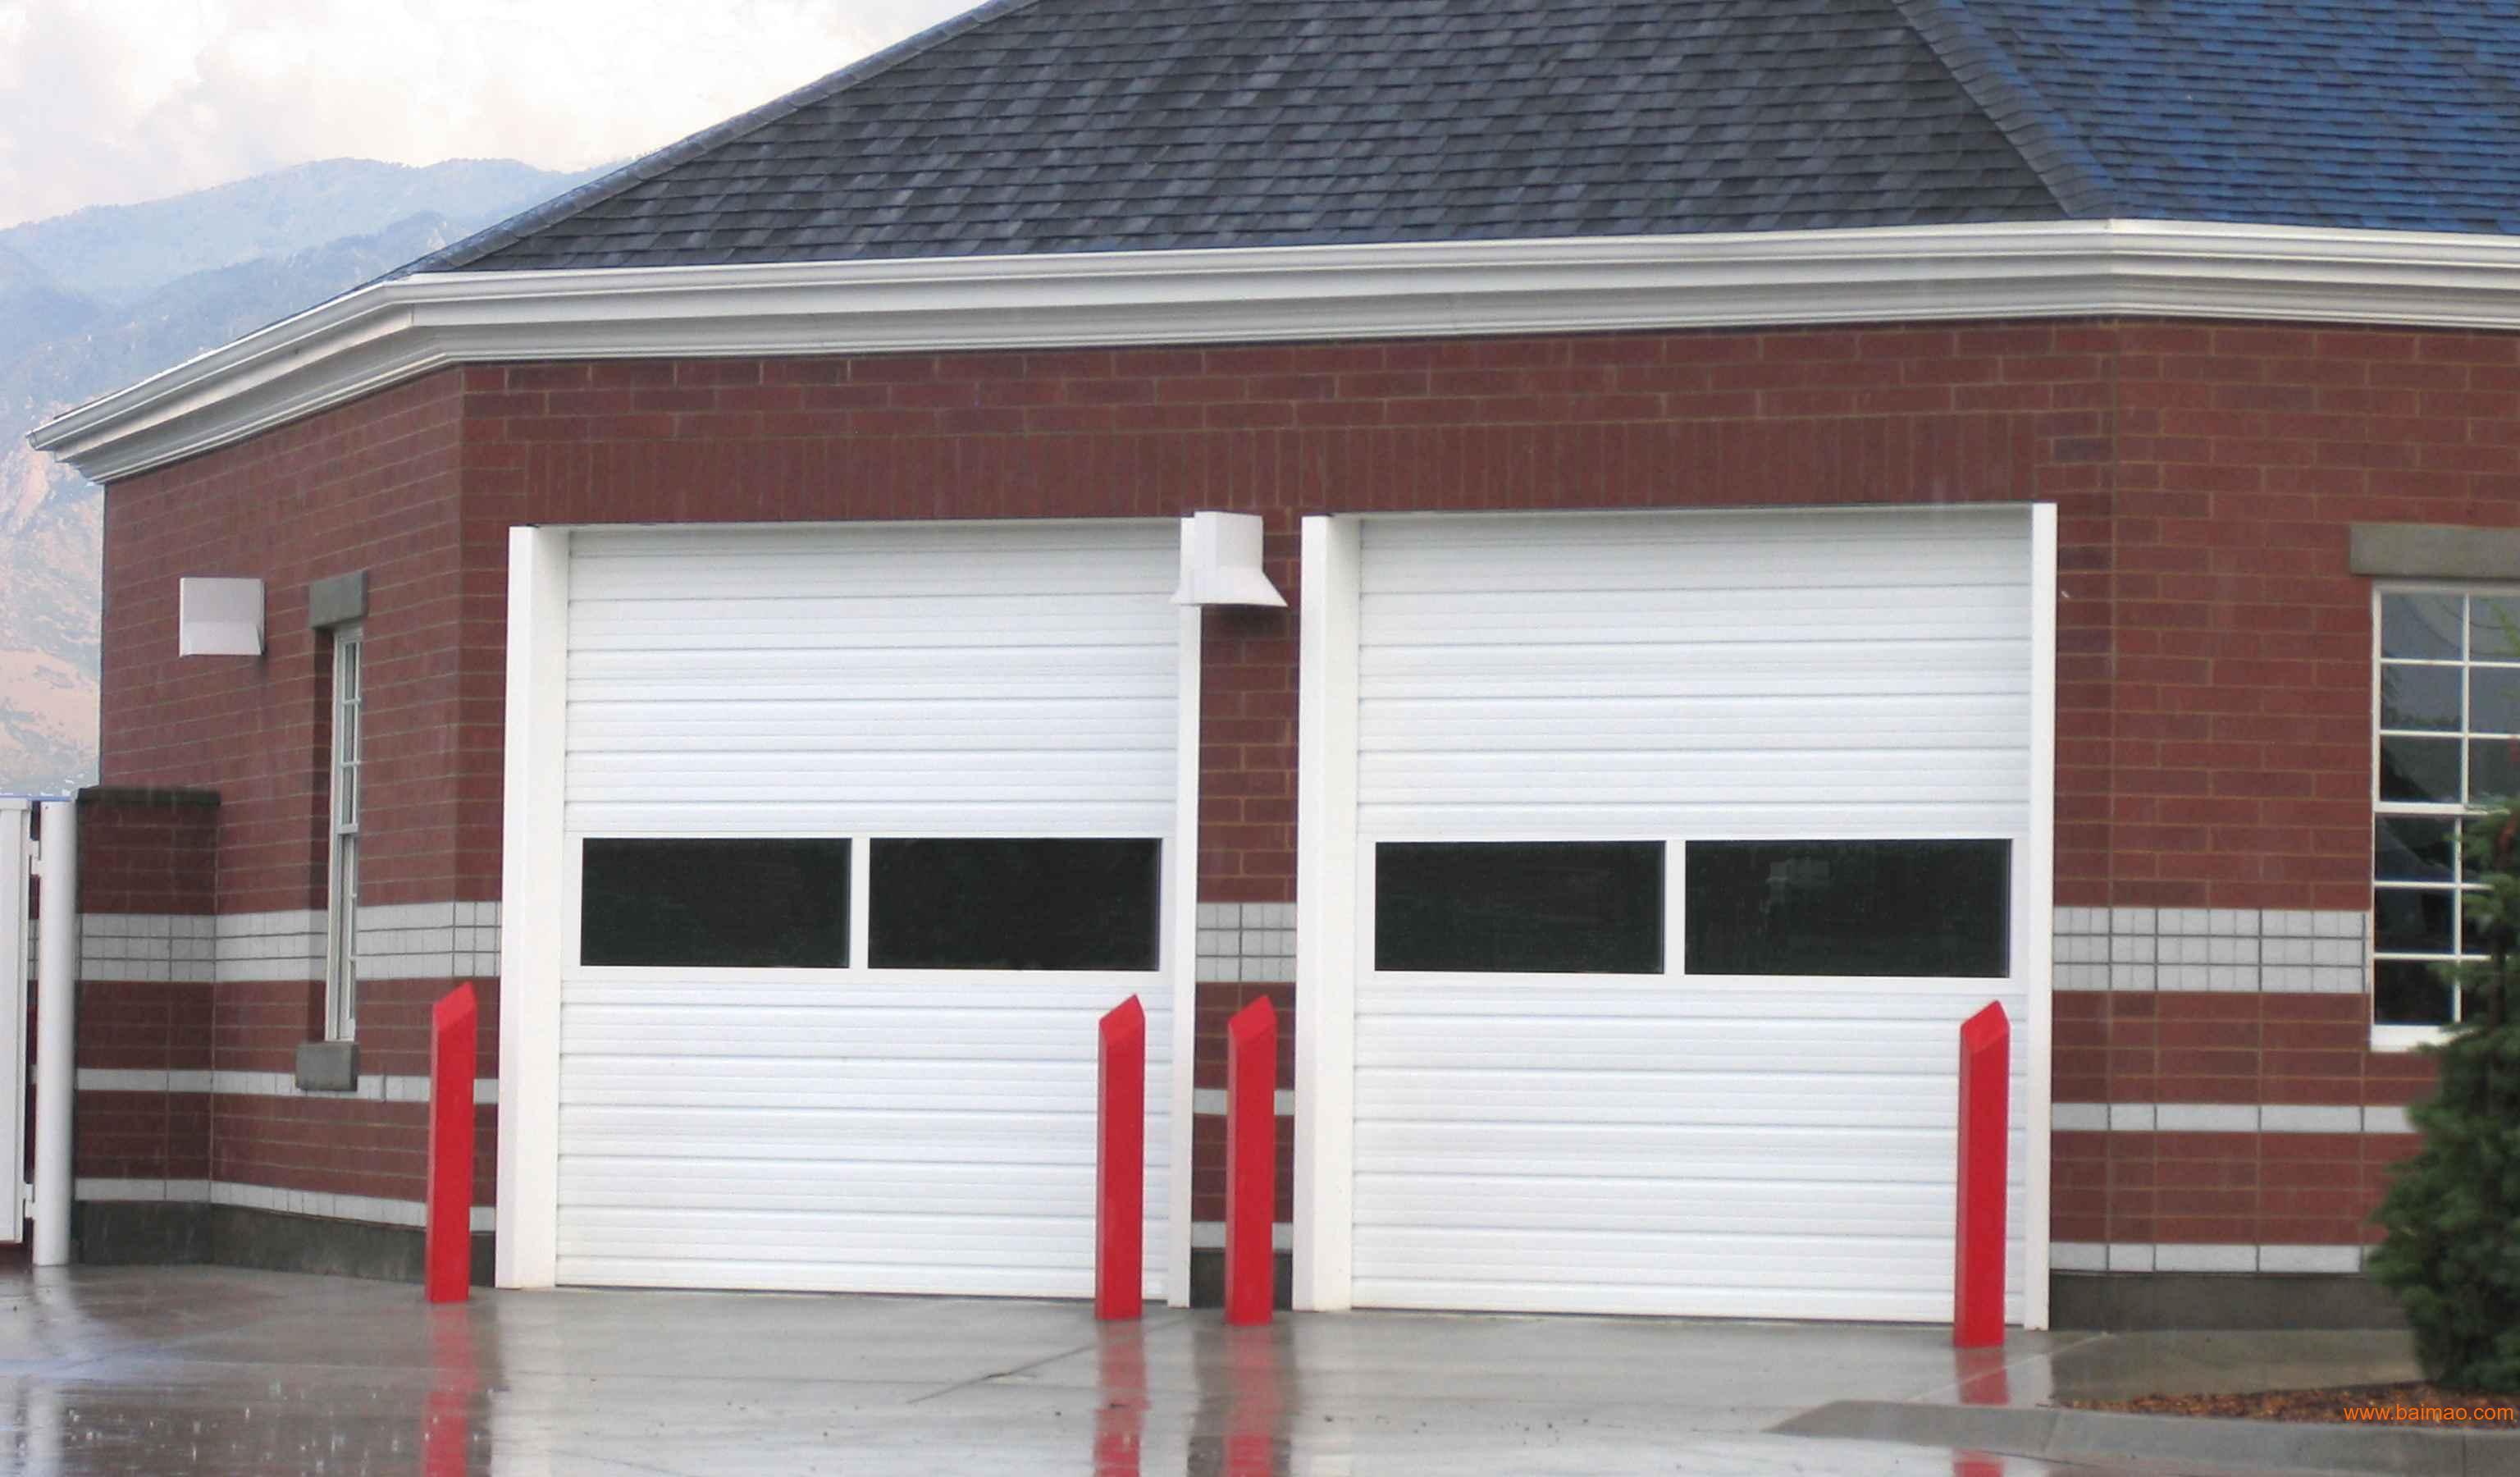 Barrie garage doors choice image door design ideas garage door barrie wageuzi garage door barrie wageuzi rubansaba rubansaba